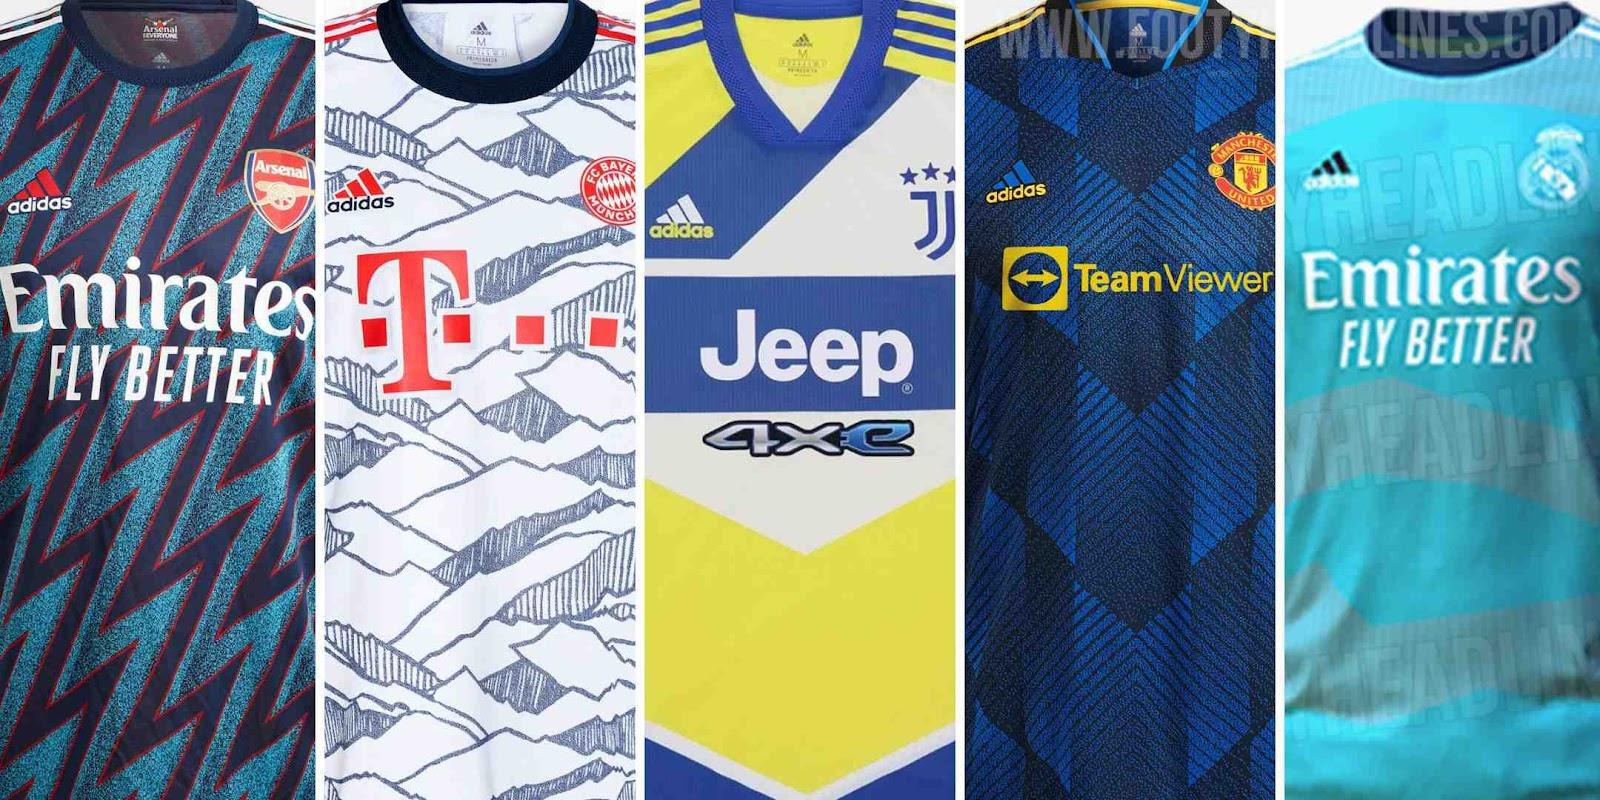 Adidas 21-22 Elite Teams EQT Third Kits Released - Real Madrid ...